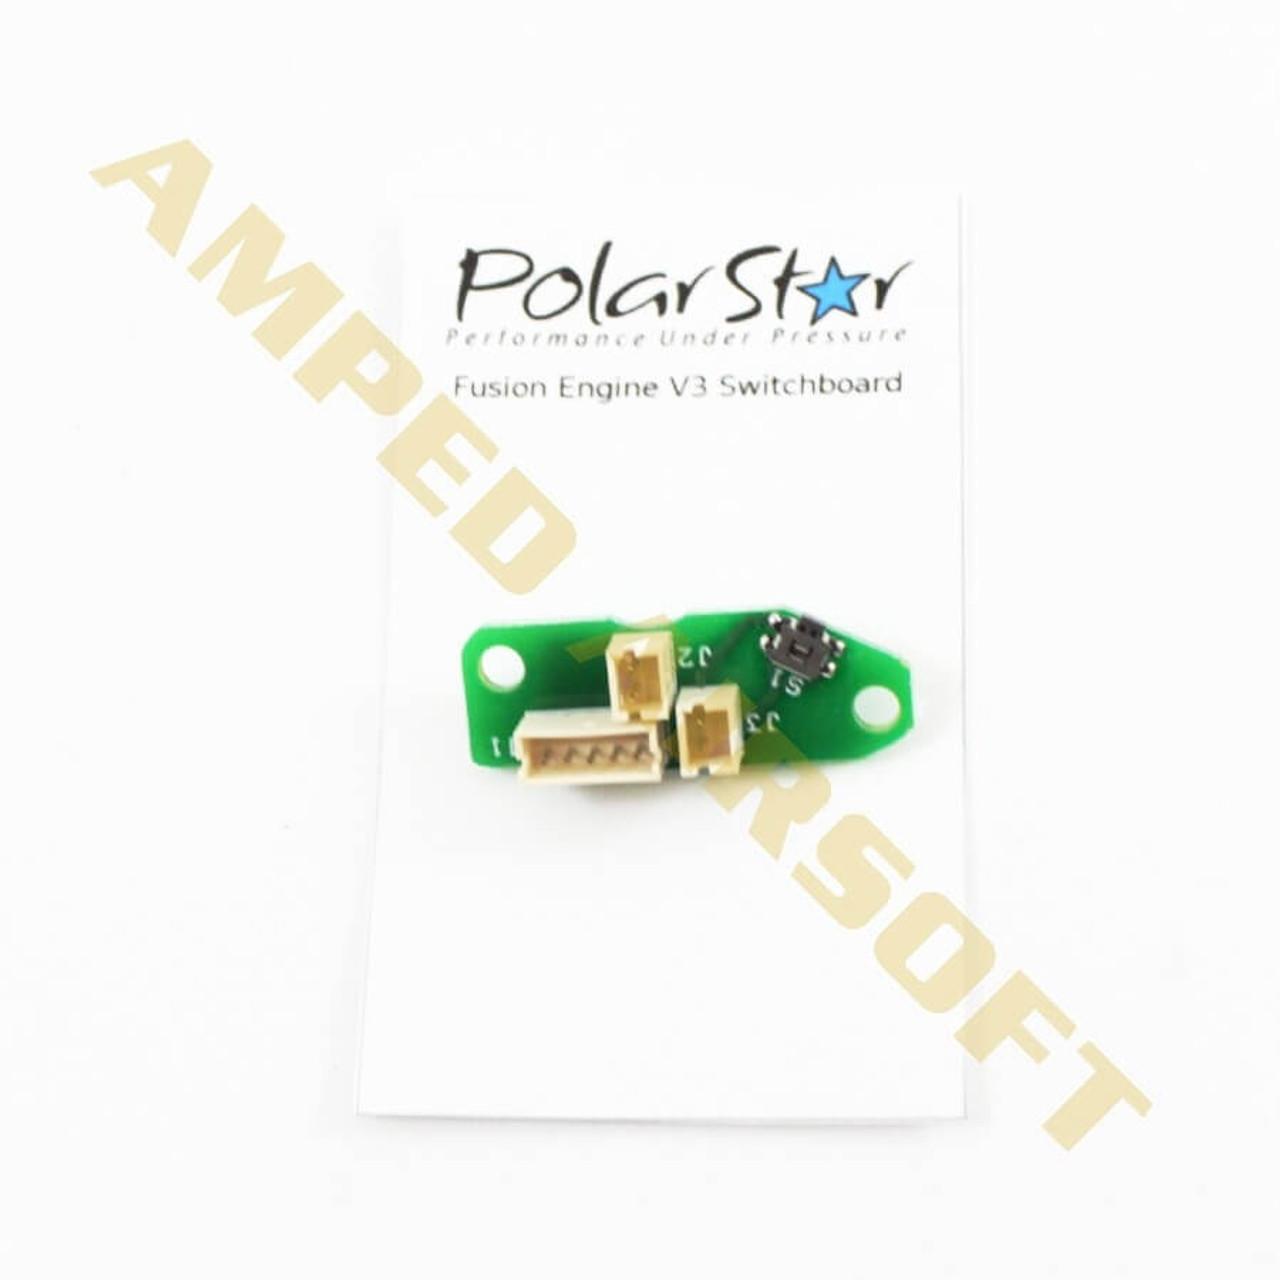 Polarstar Fusion Engine V2 Gen2 Terrariumtvshows Trigger Switch And Mini Circuit Board Bingo Airsoftworks